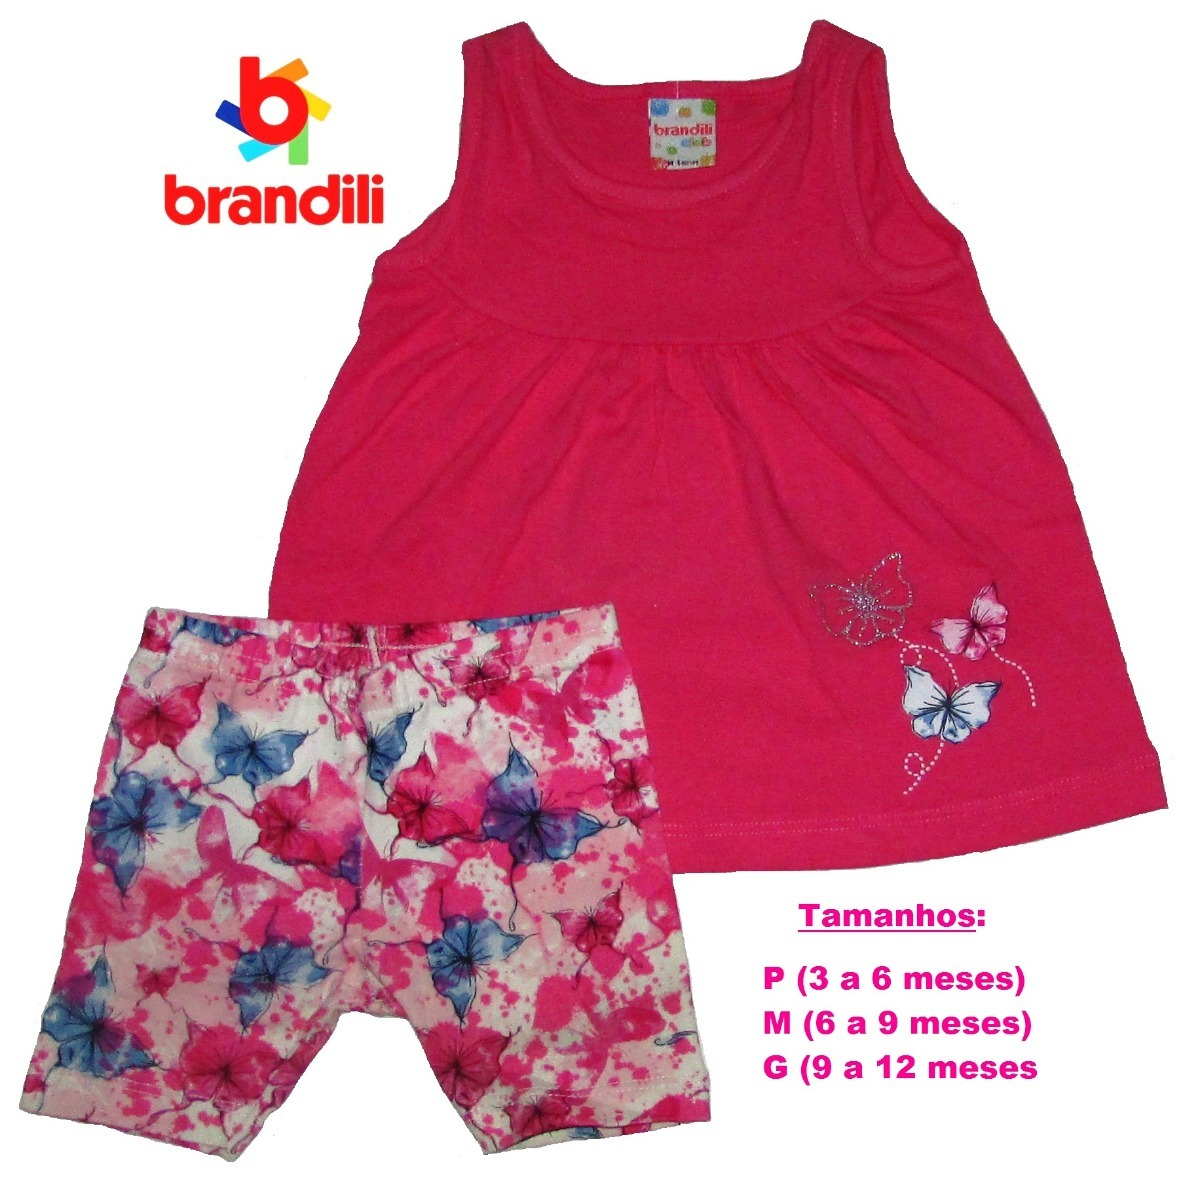 06bb2695f5 Conjunto Brandili Bebê Mini Vestido Com Bermuda - R  32